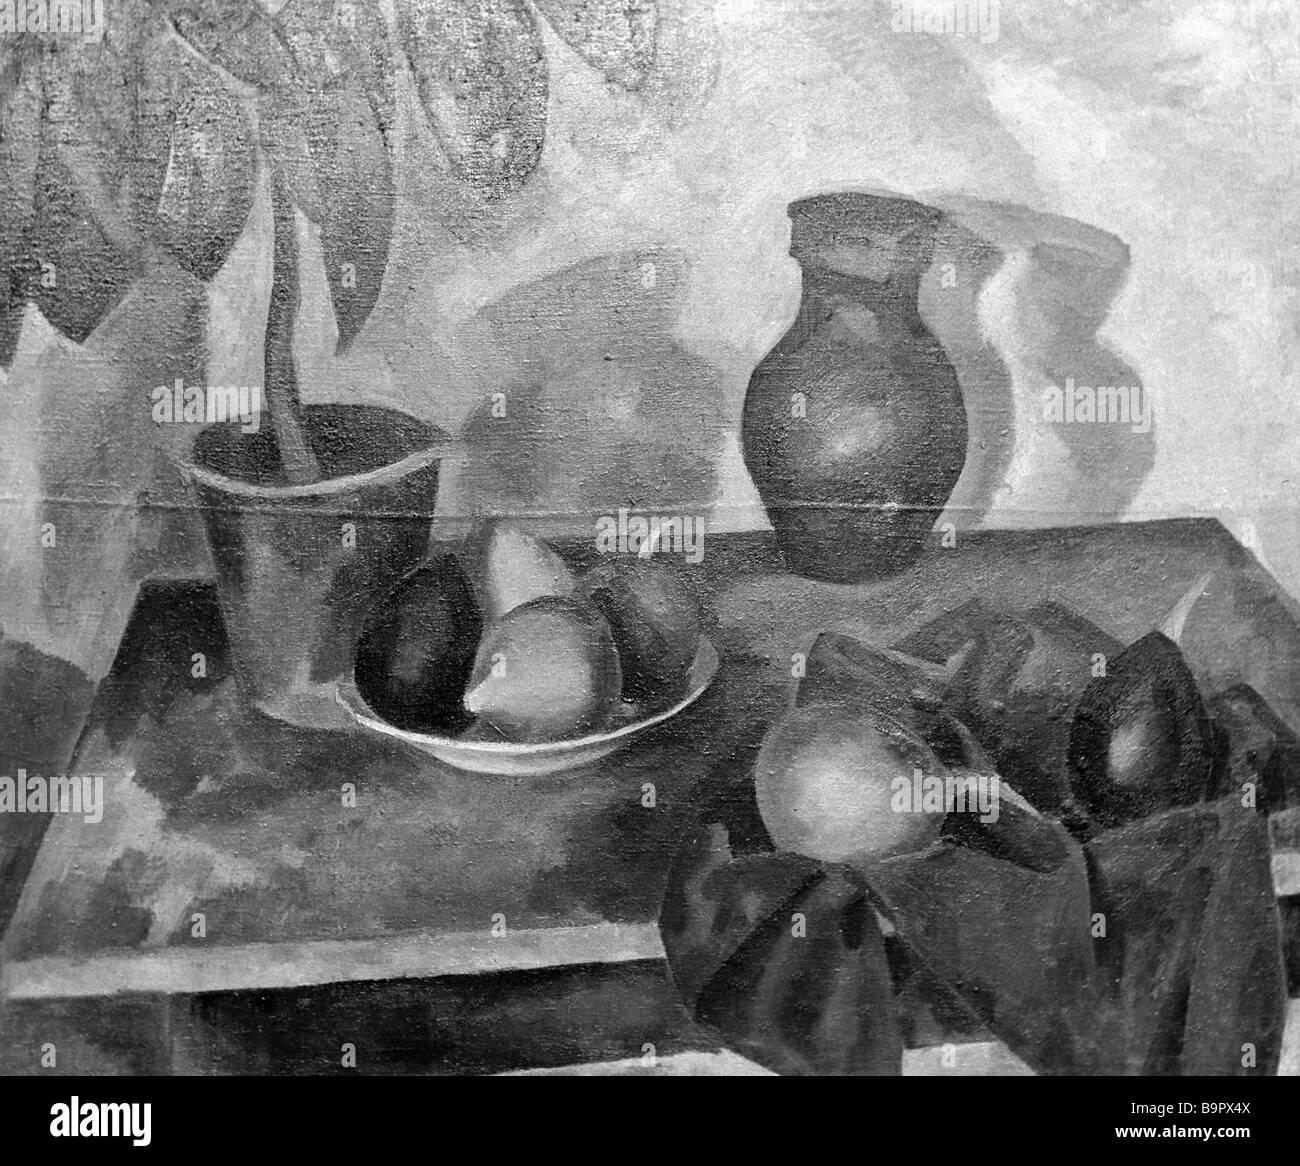 Robert Falk s reproduce bodegón con la planta de caucho Imagen De Stock